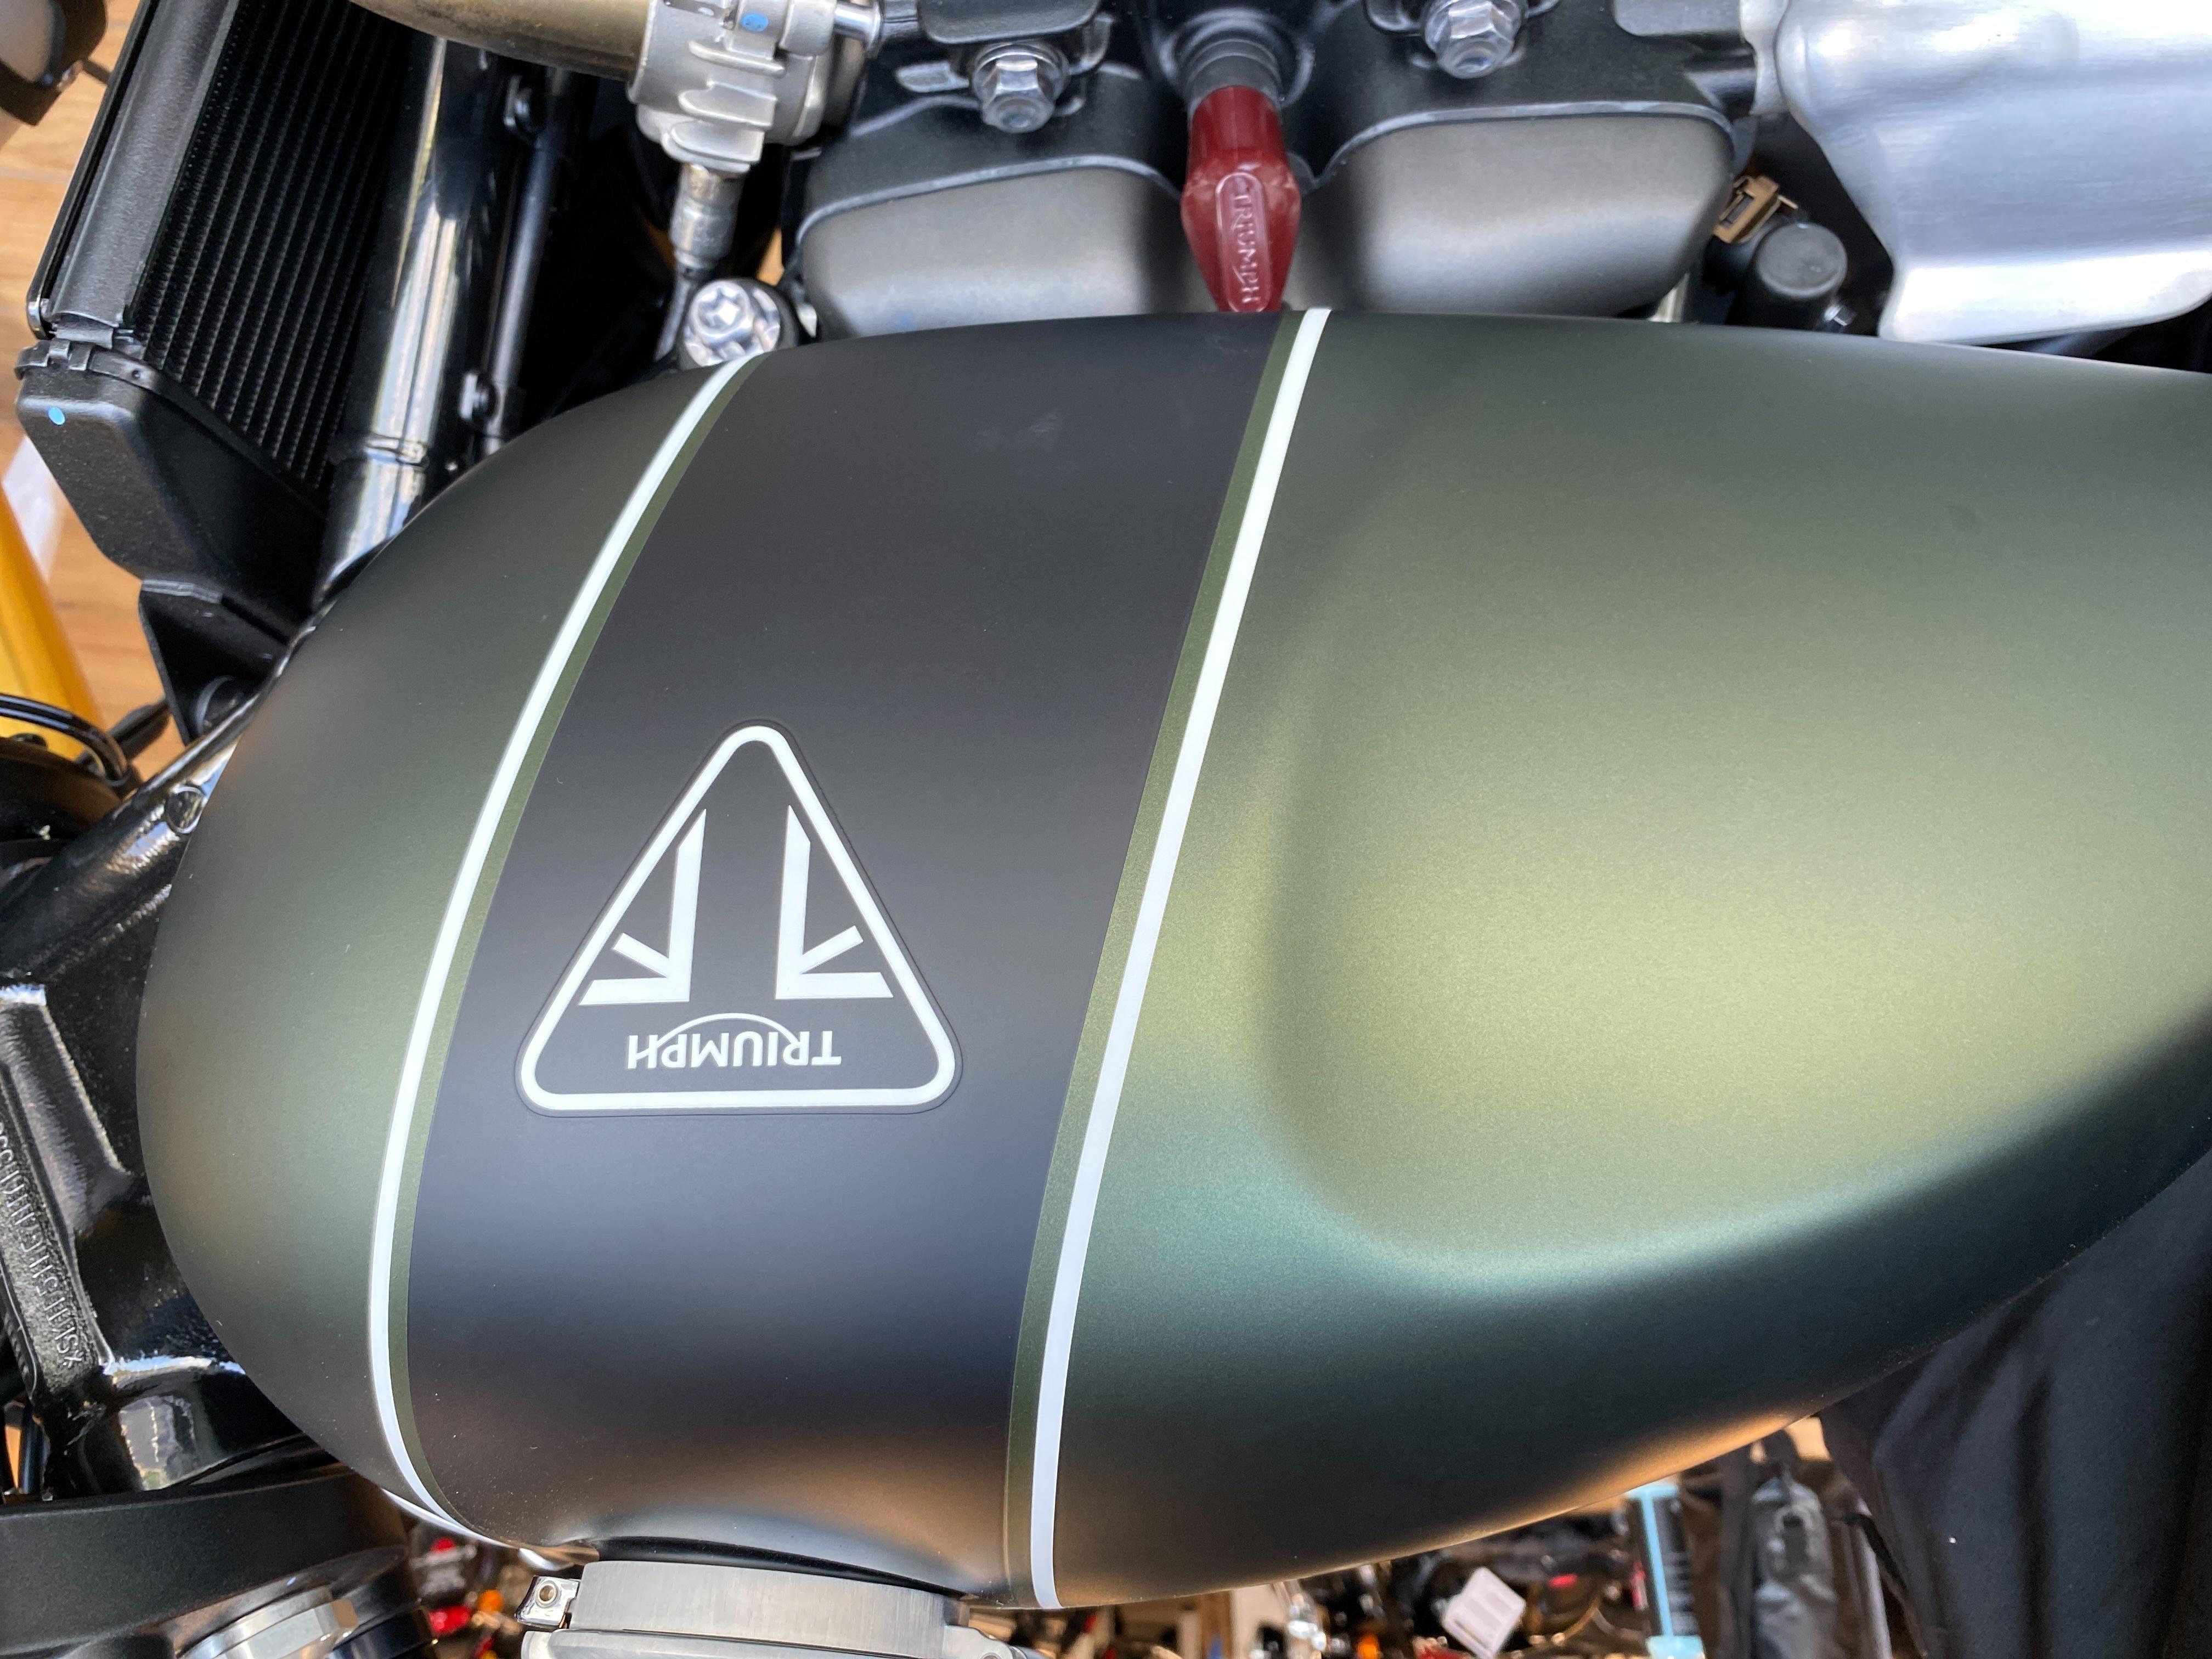 2022 Triumph Scrambler 1200 XE at Frontline Eurosports